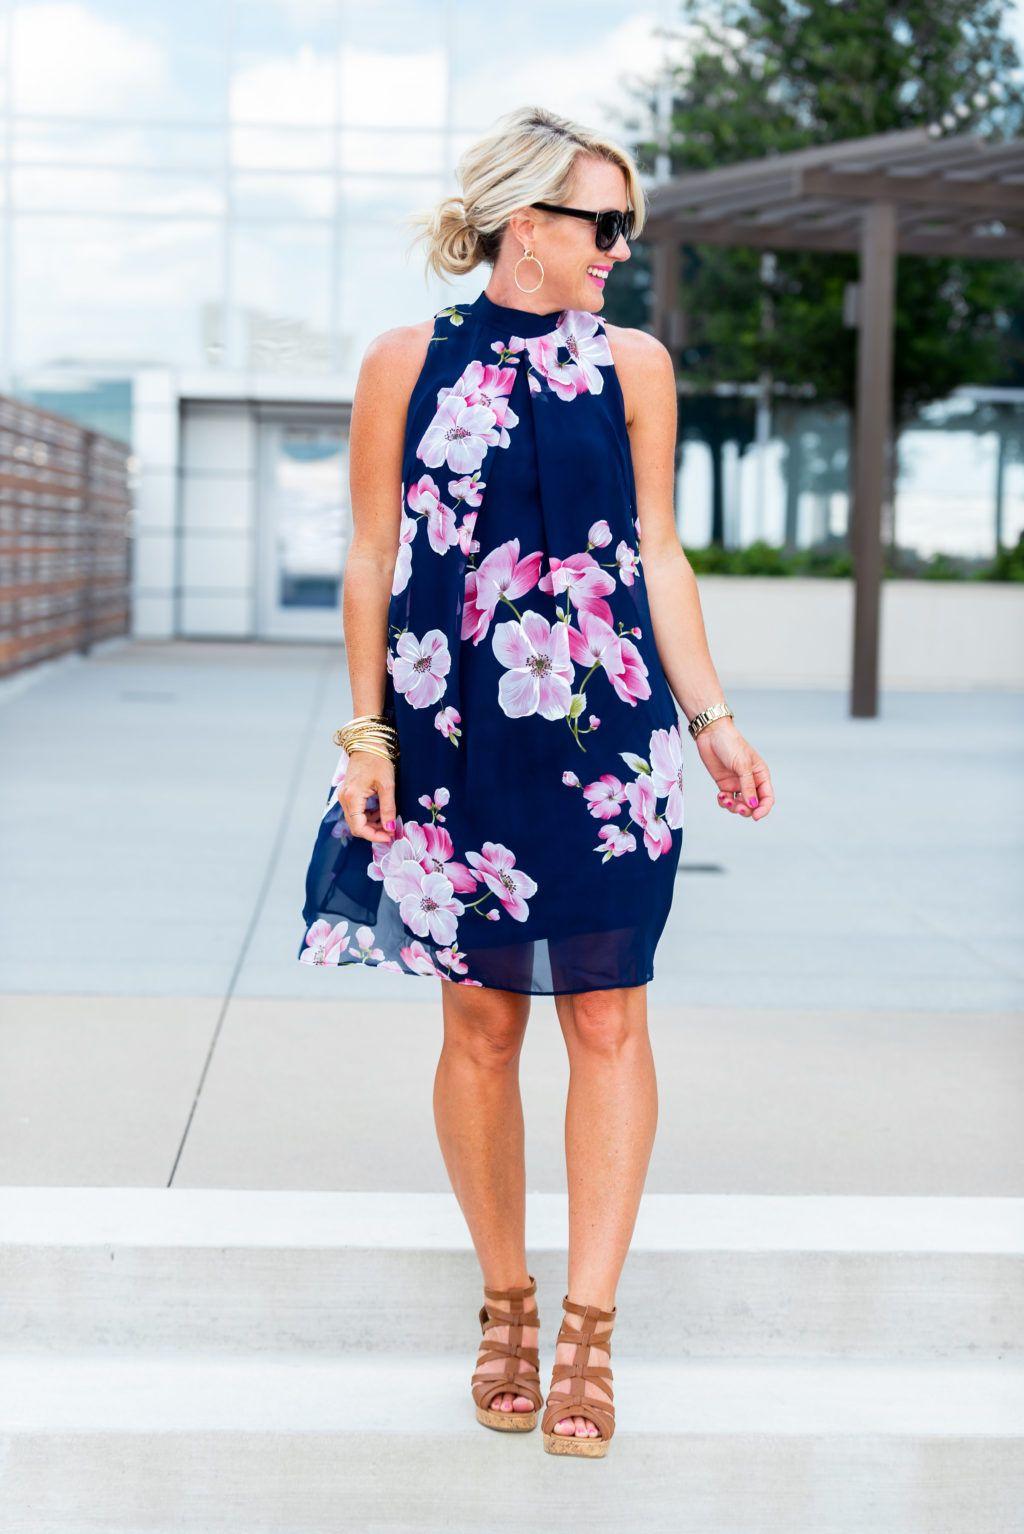 Jcpenney Floral Dress Summer Older Women Dresses Floral Dress Summer Jcpenney Dresses [ 1534 x 1024 Pixel ]